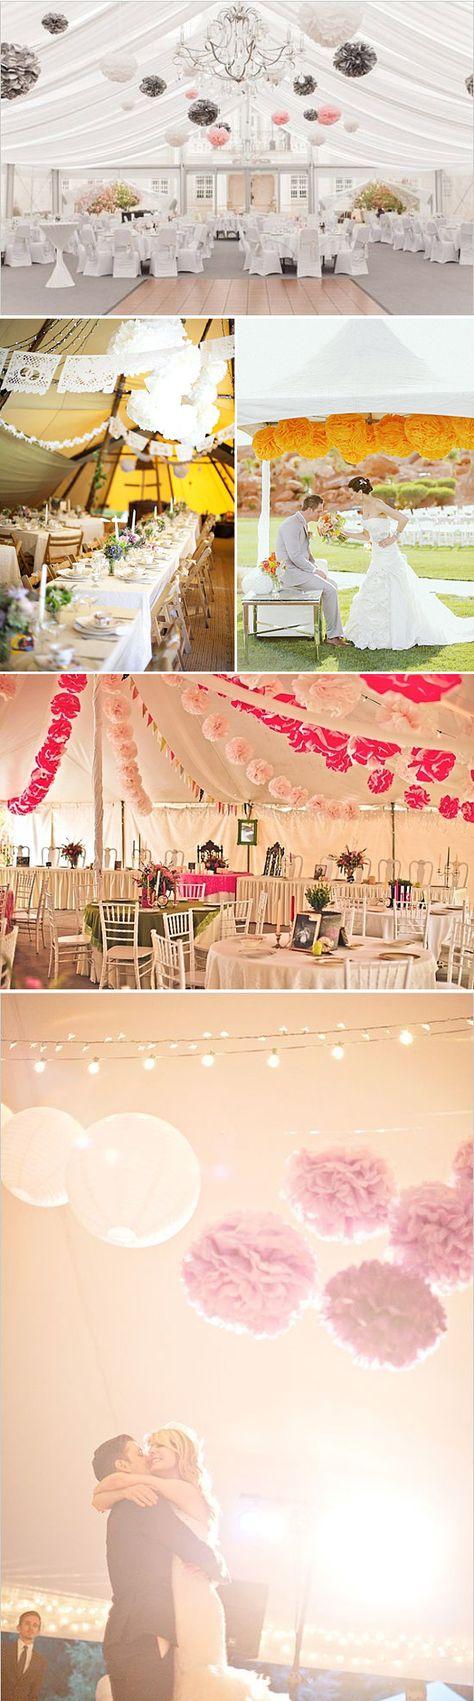 Winter Wonderland Centros para Beautiful Feel boda